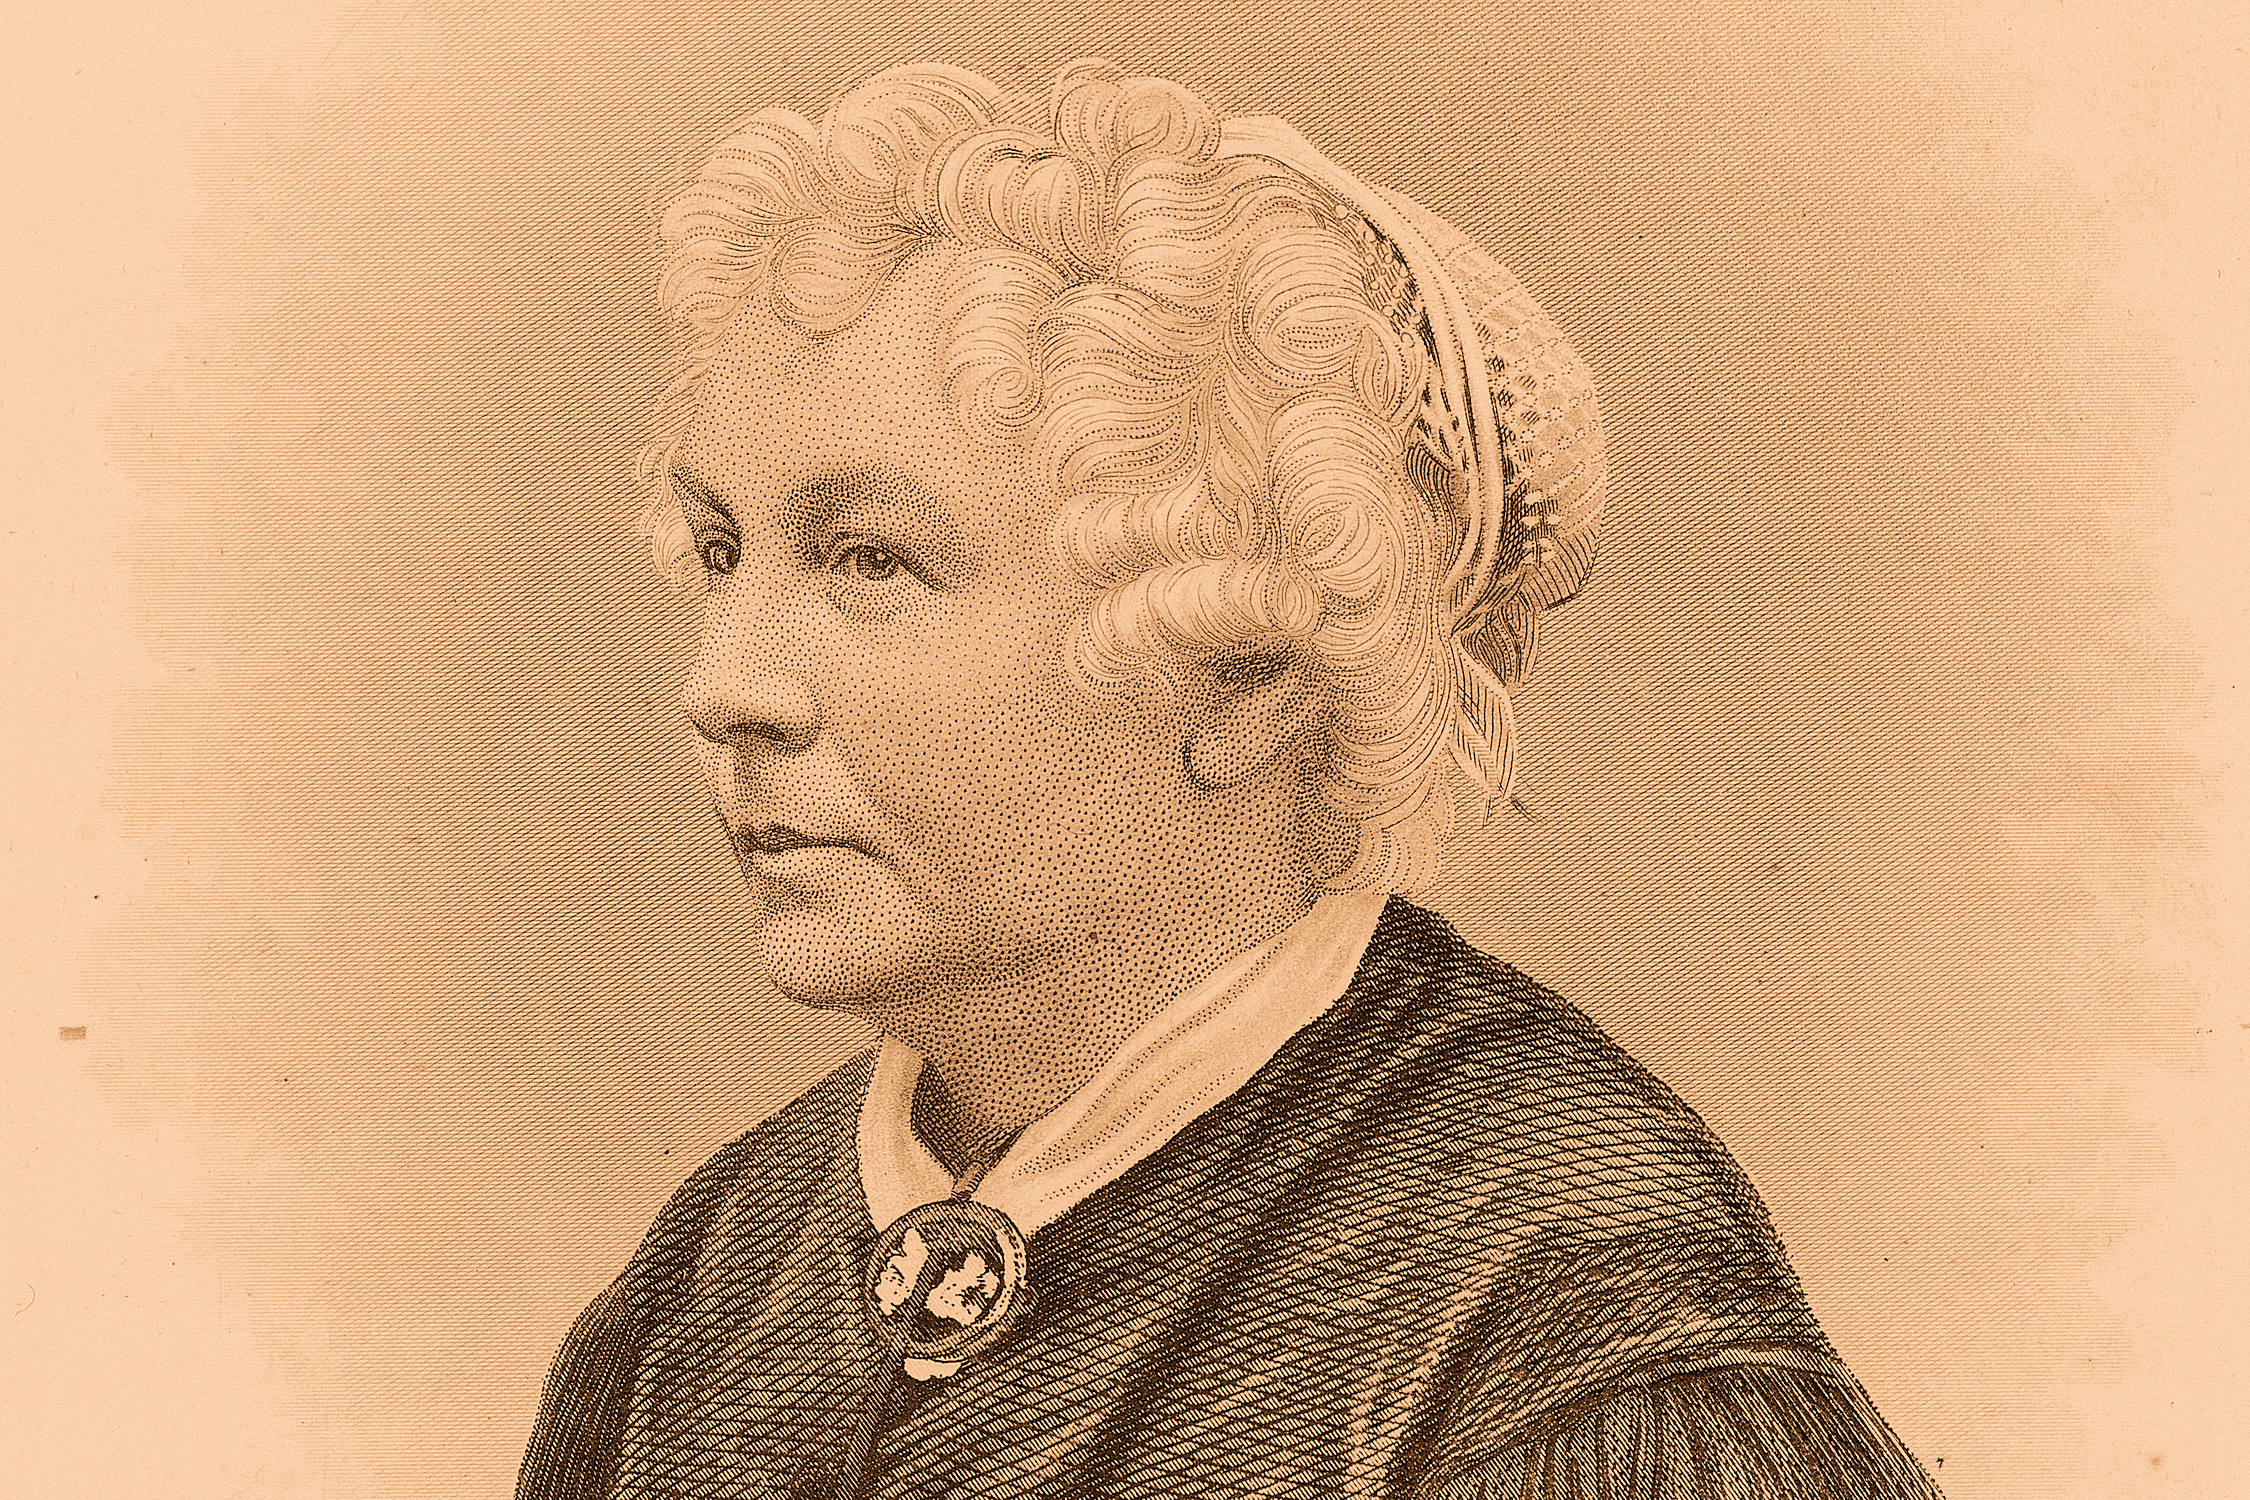 Elizabeth Cady Stanton, about 1870